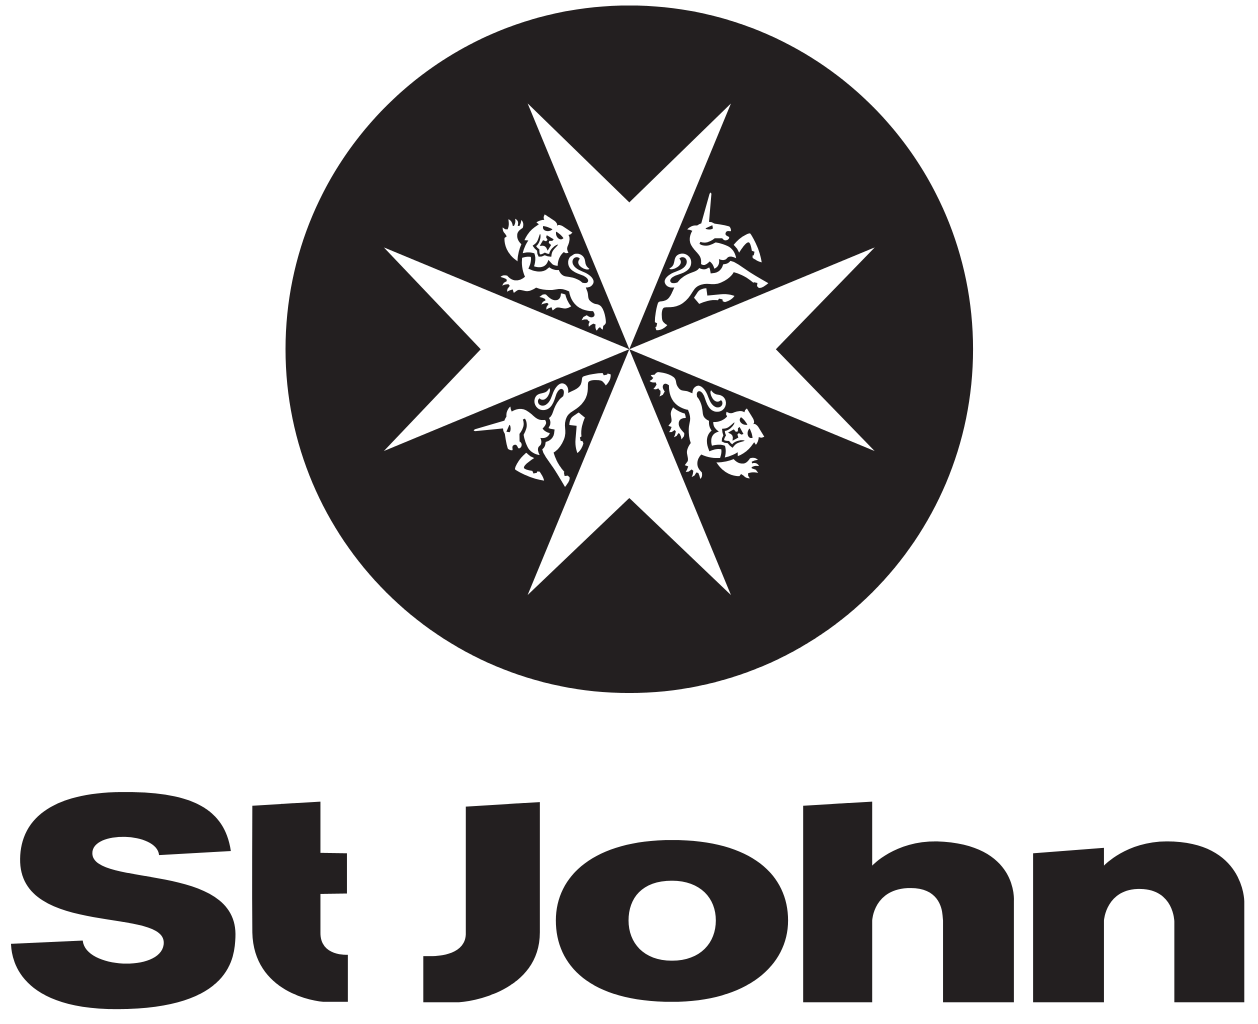 St_John_New_Zealand_logo